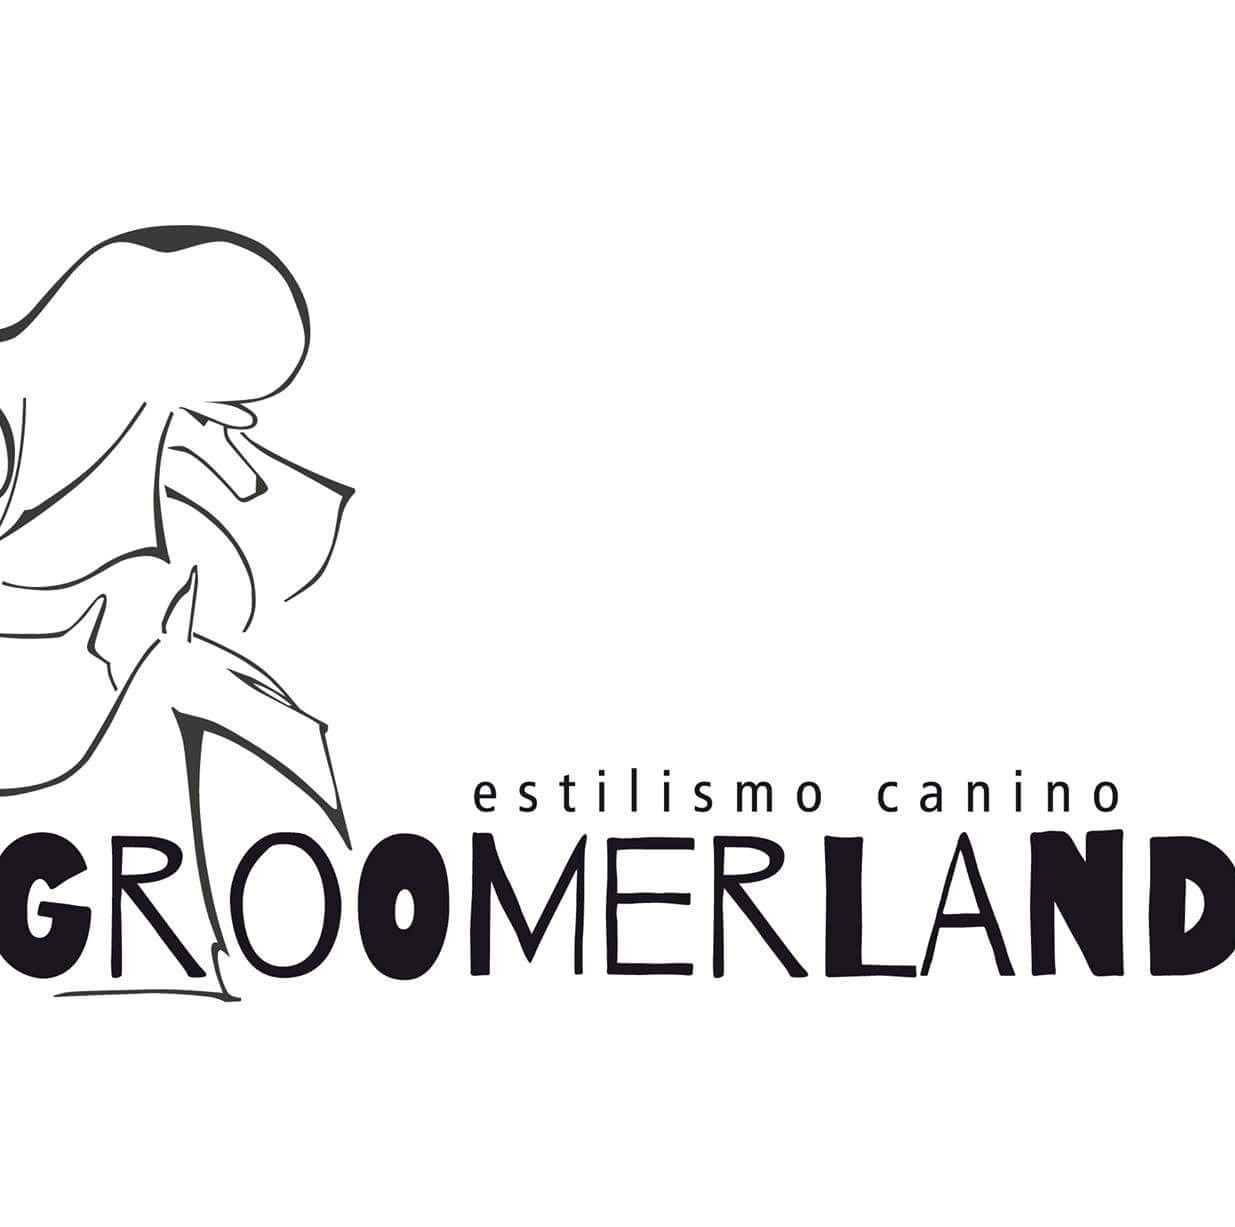 Peluquerias Caninas en Madrid Groomerland